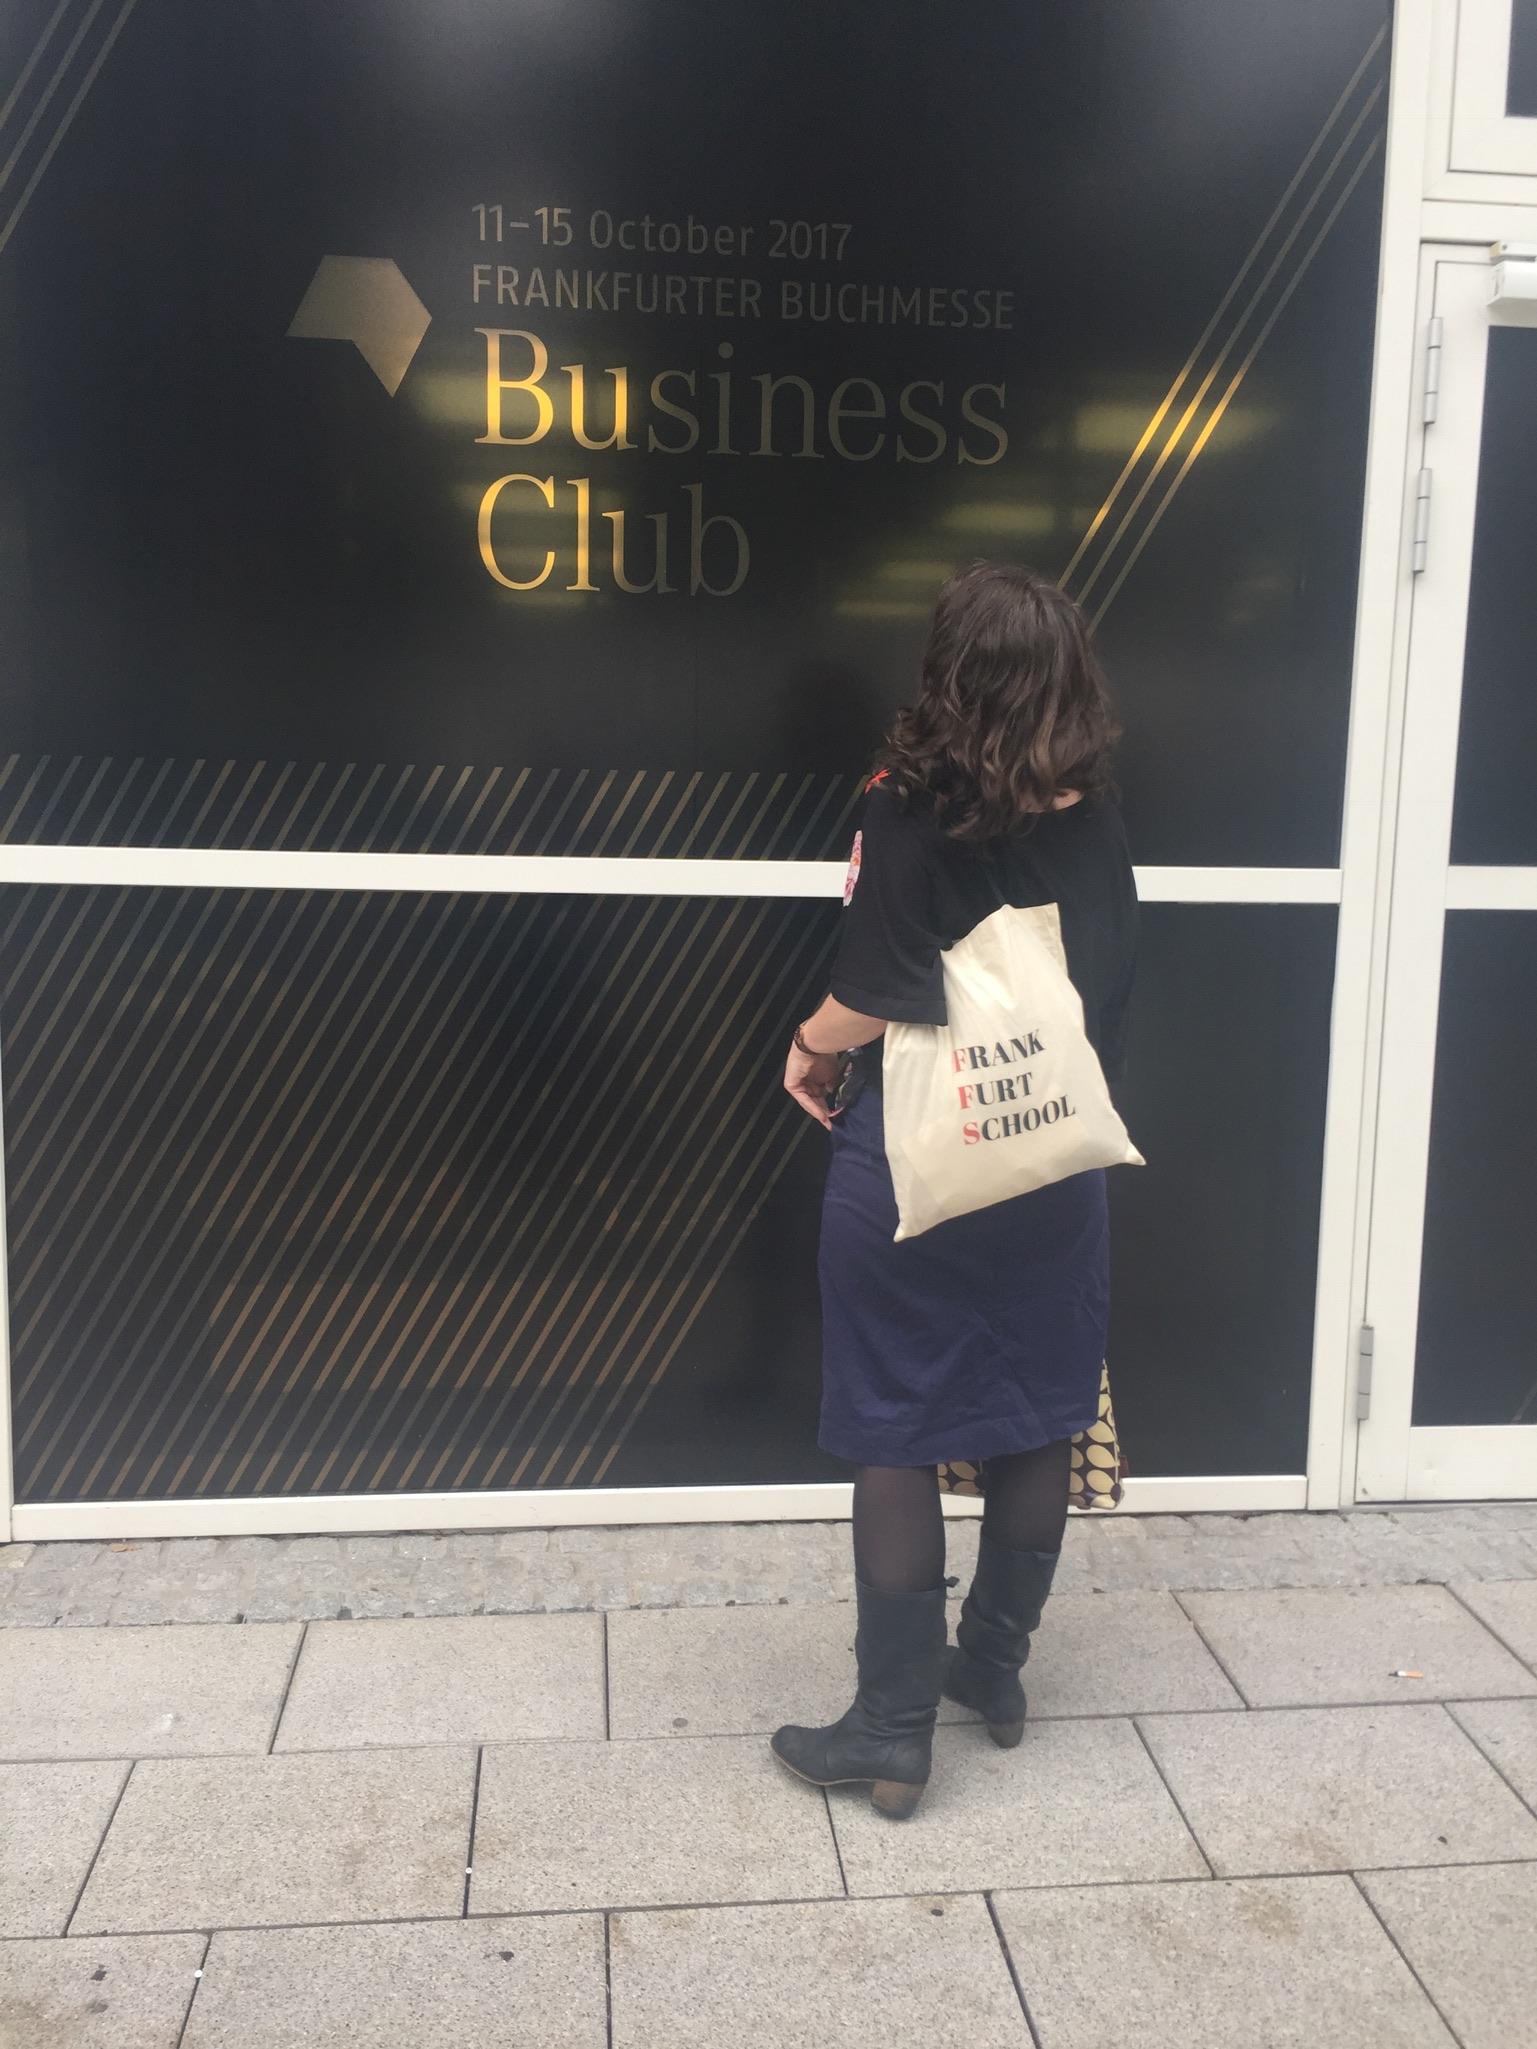 At the Frankfurt Book Fair Business Club